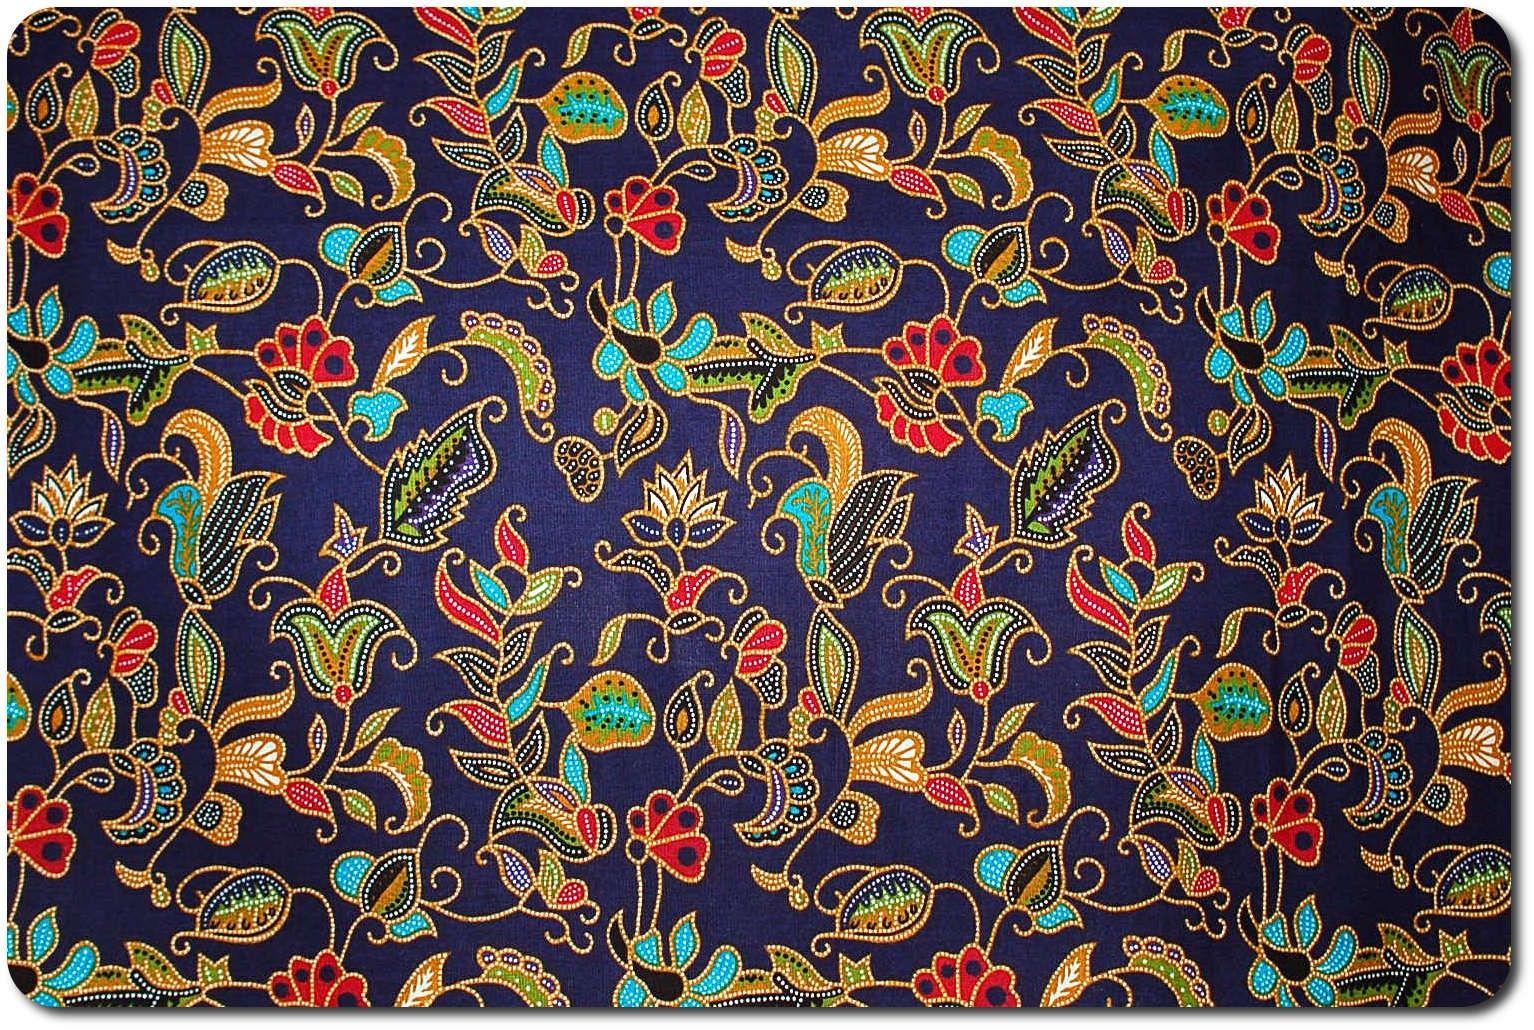 Sejarah Batik Palembang